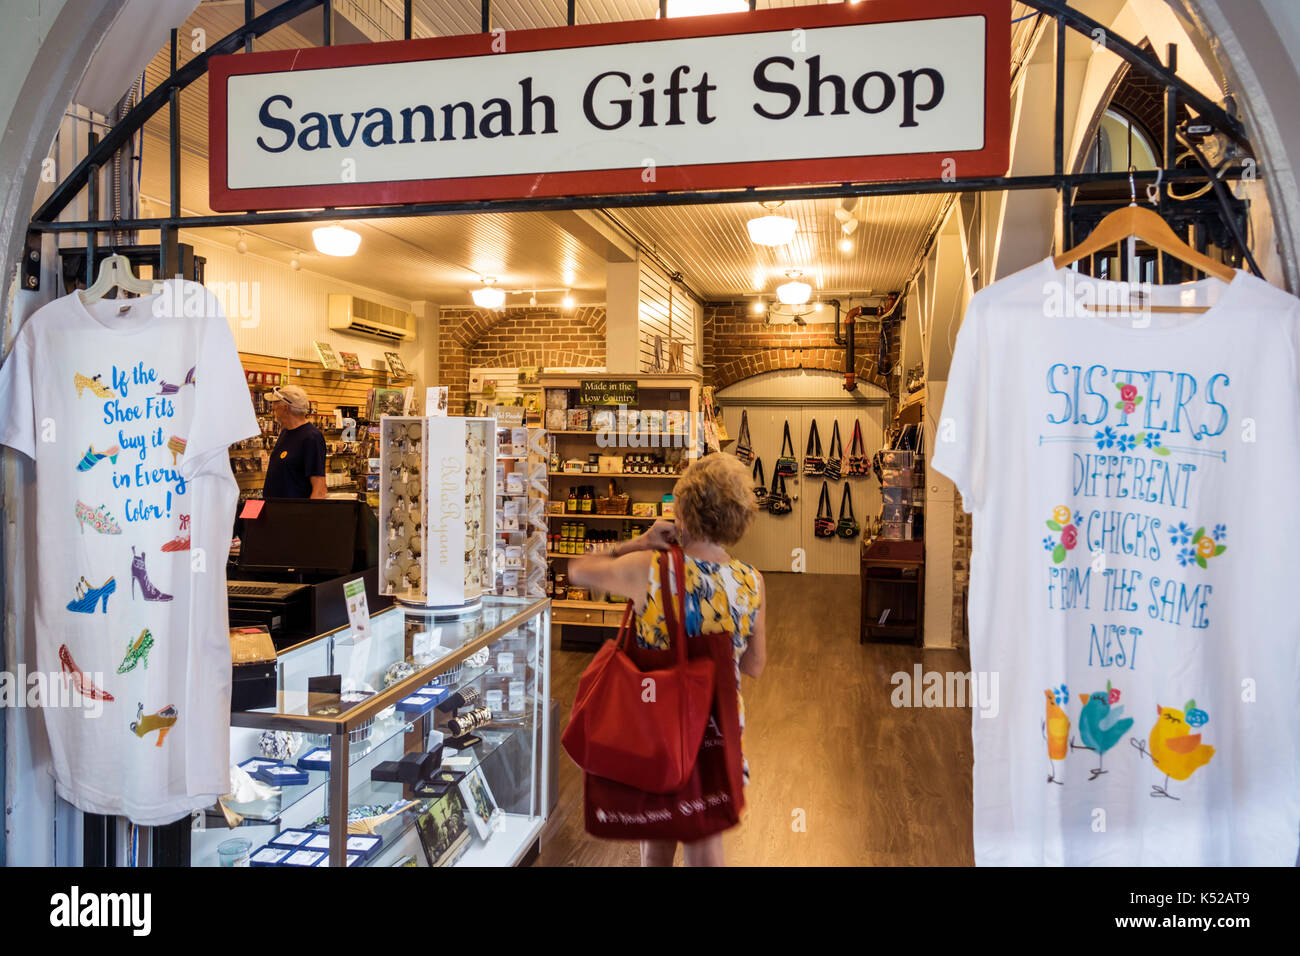 2fbbc9cce19d5 Savannah Georgia Visitors Information Center inside gift shop shopping tee  t-shirt